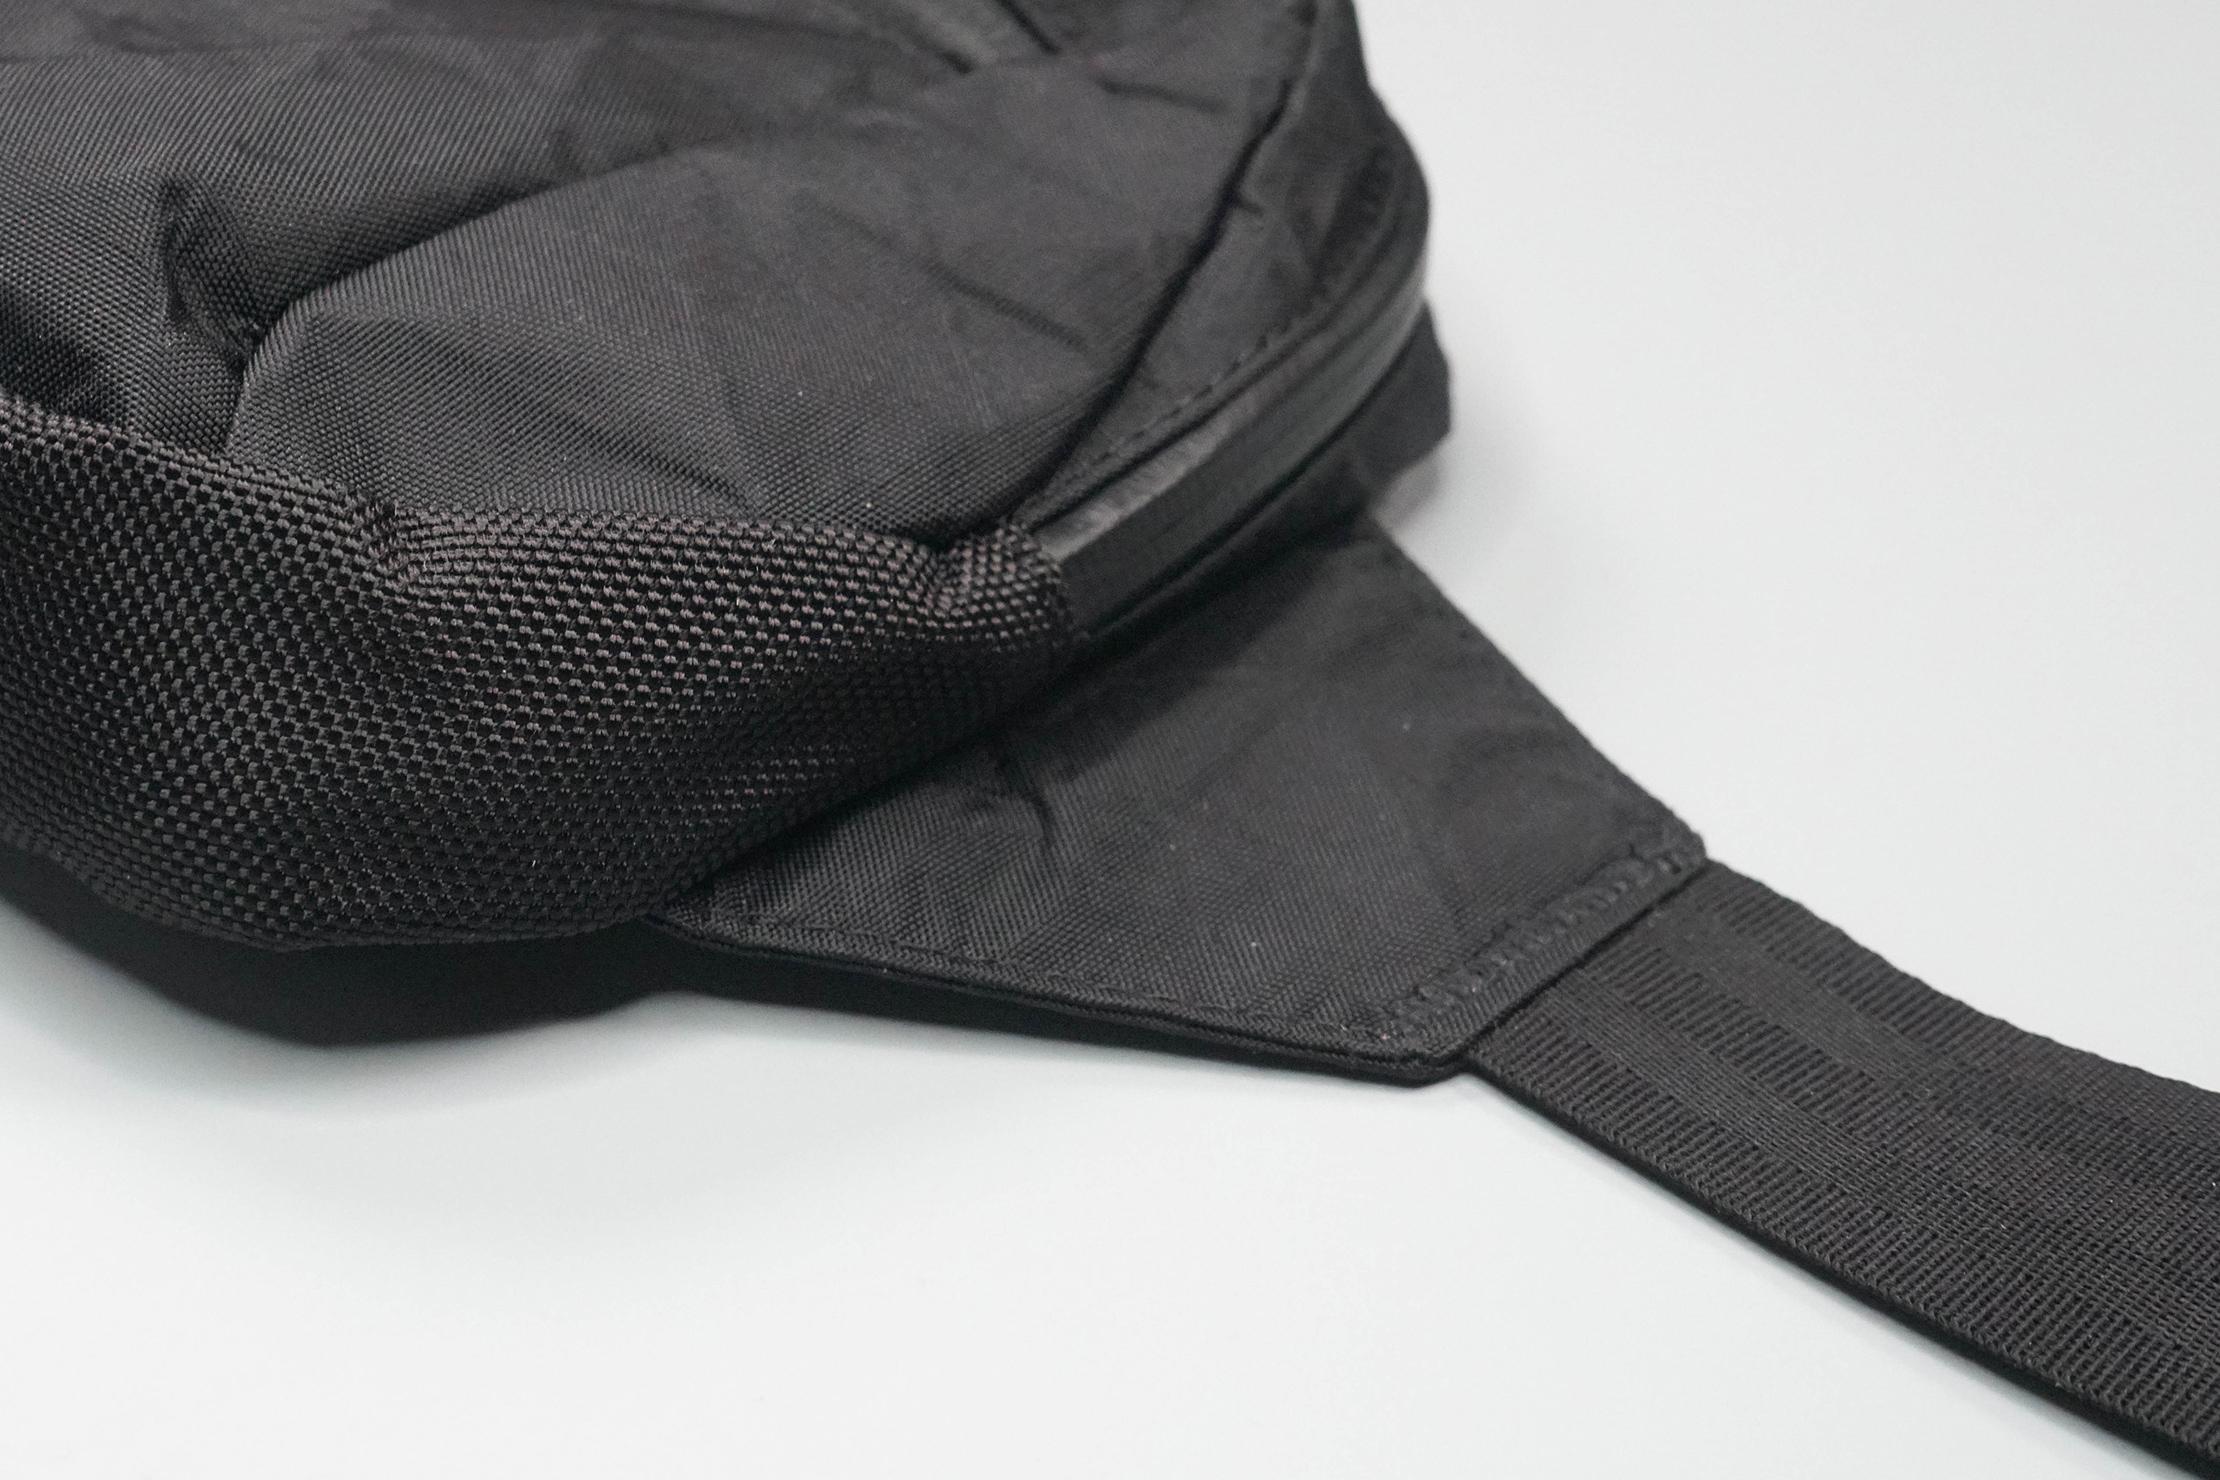 Chrome Industries Ziptop Waistpack Strap Attachment